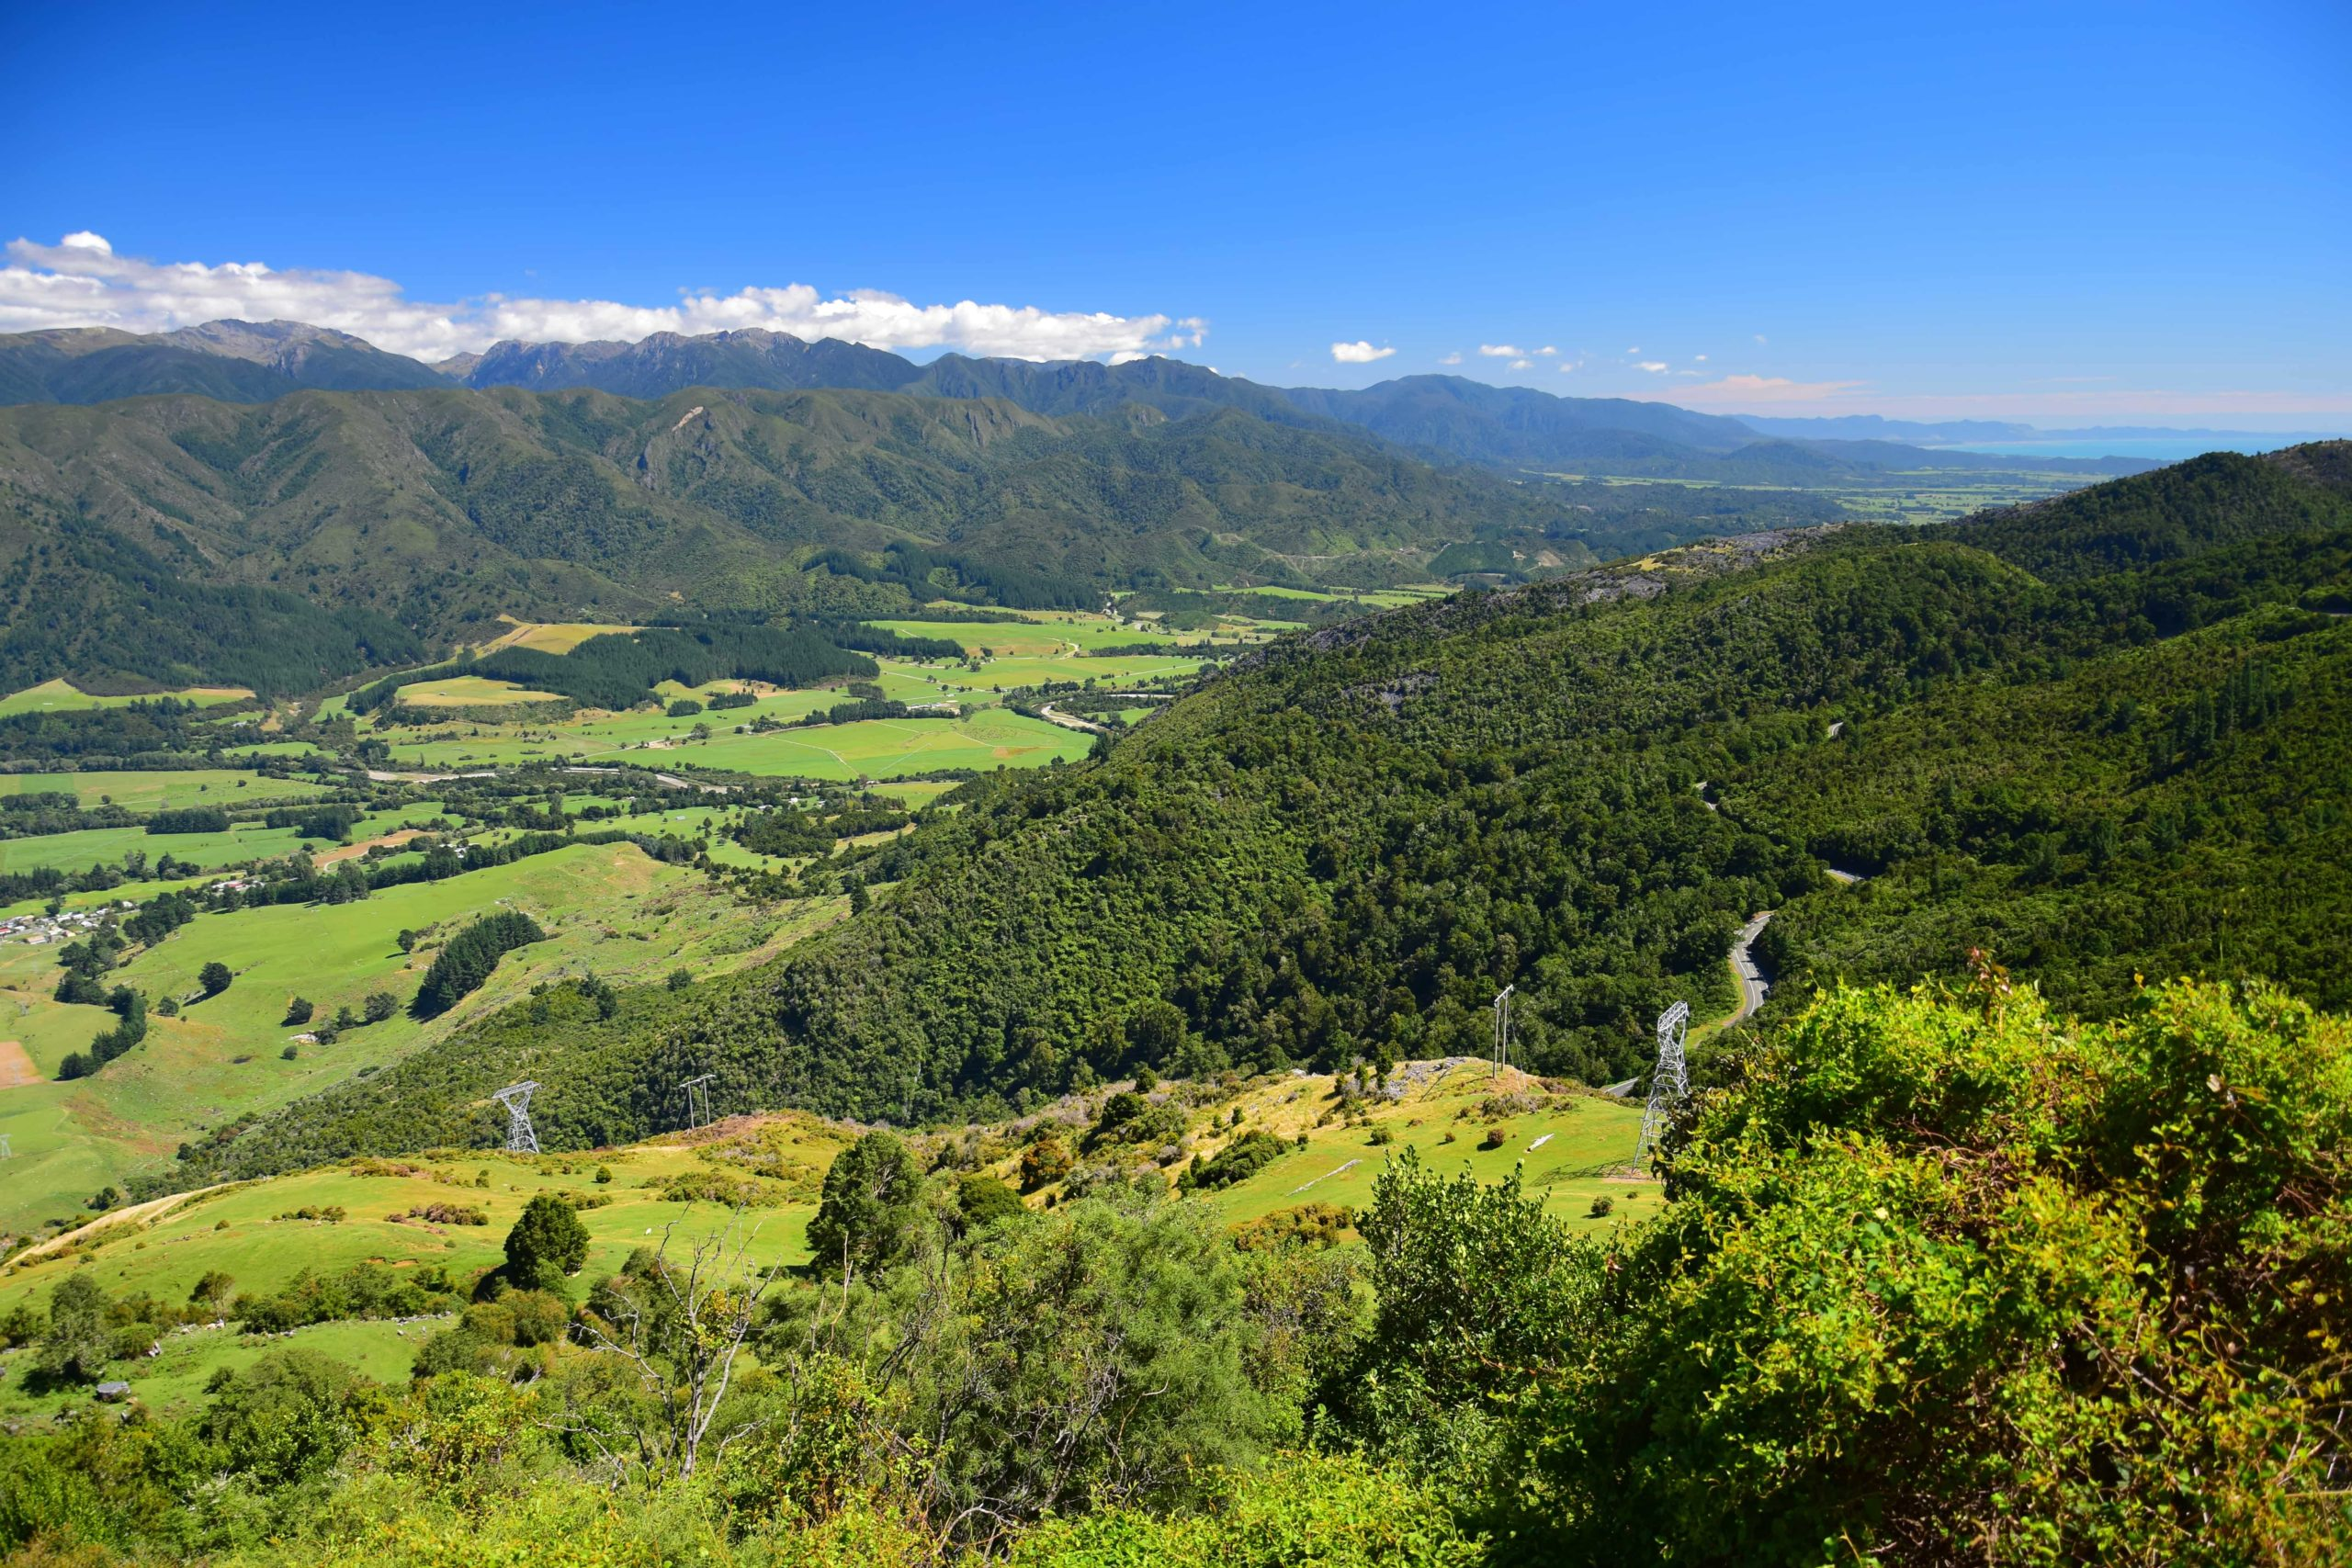 The mountainous landscape of the Nelson region